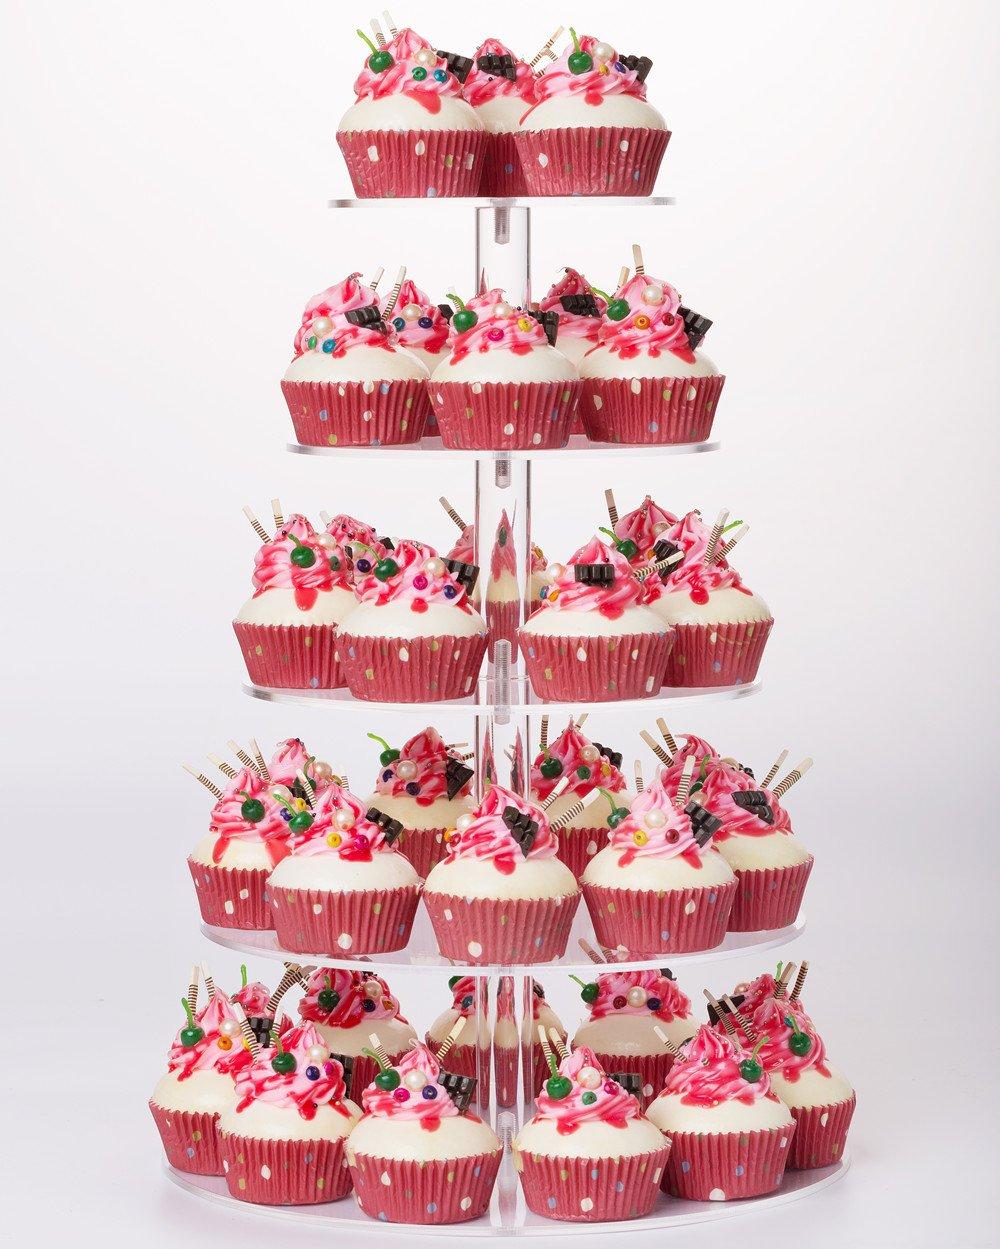 Amazon.com: YestBuy 5 Tier Round Wedding Party Acrylic Cake Cupcake ...